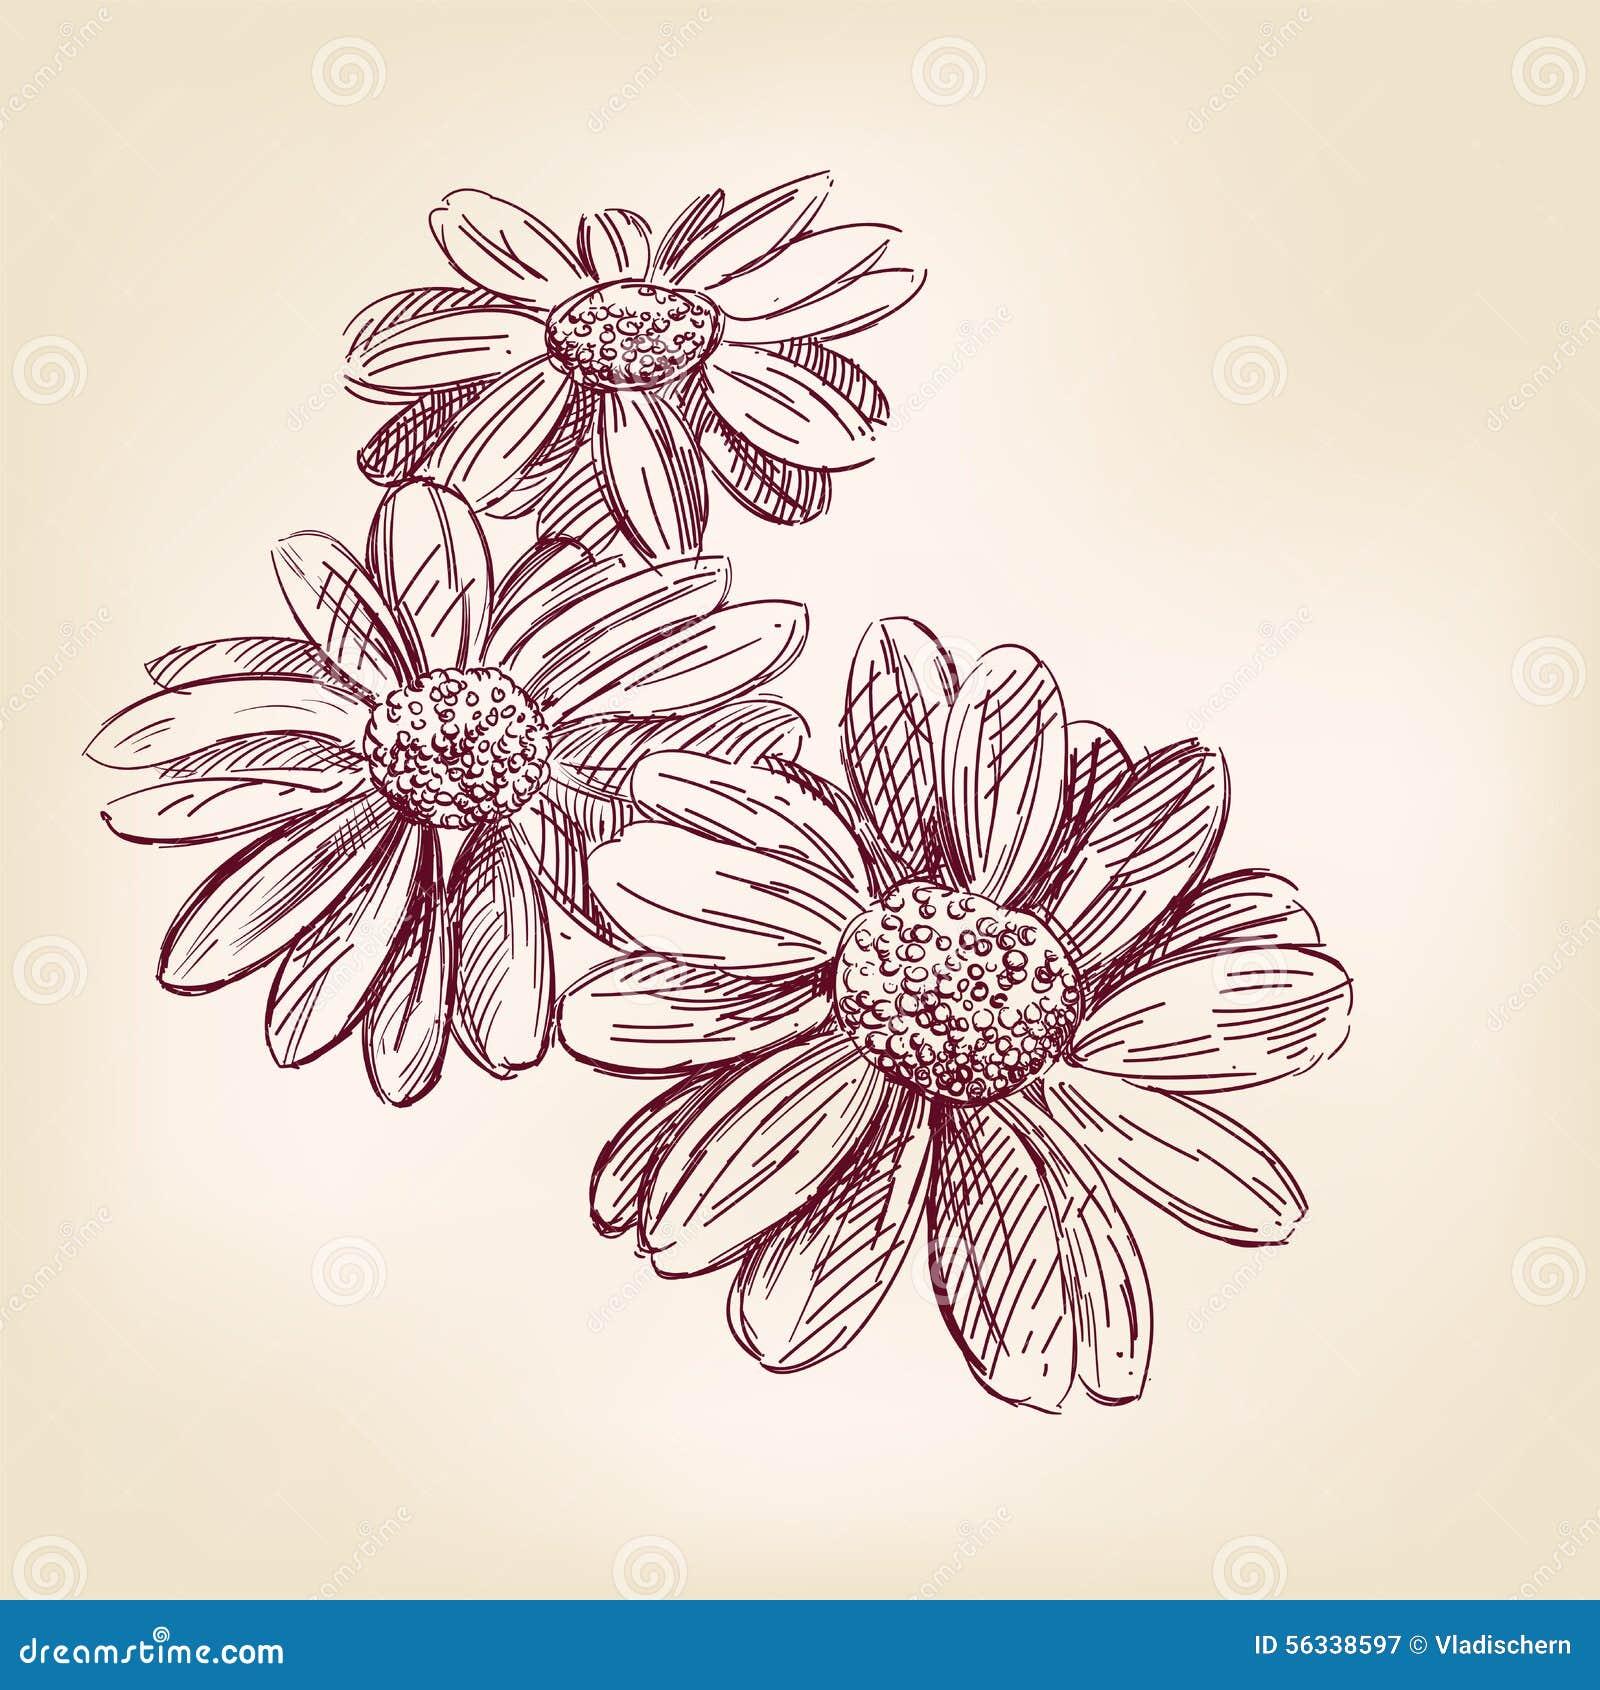 Daisy Color Sketch Flower Pencil Stock Photos Images